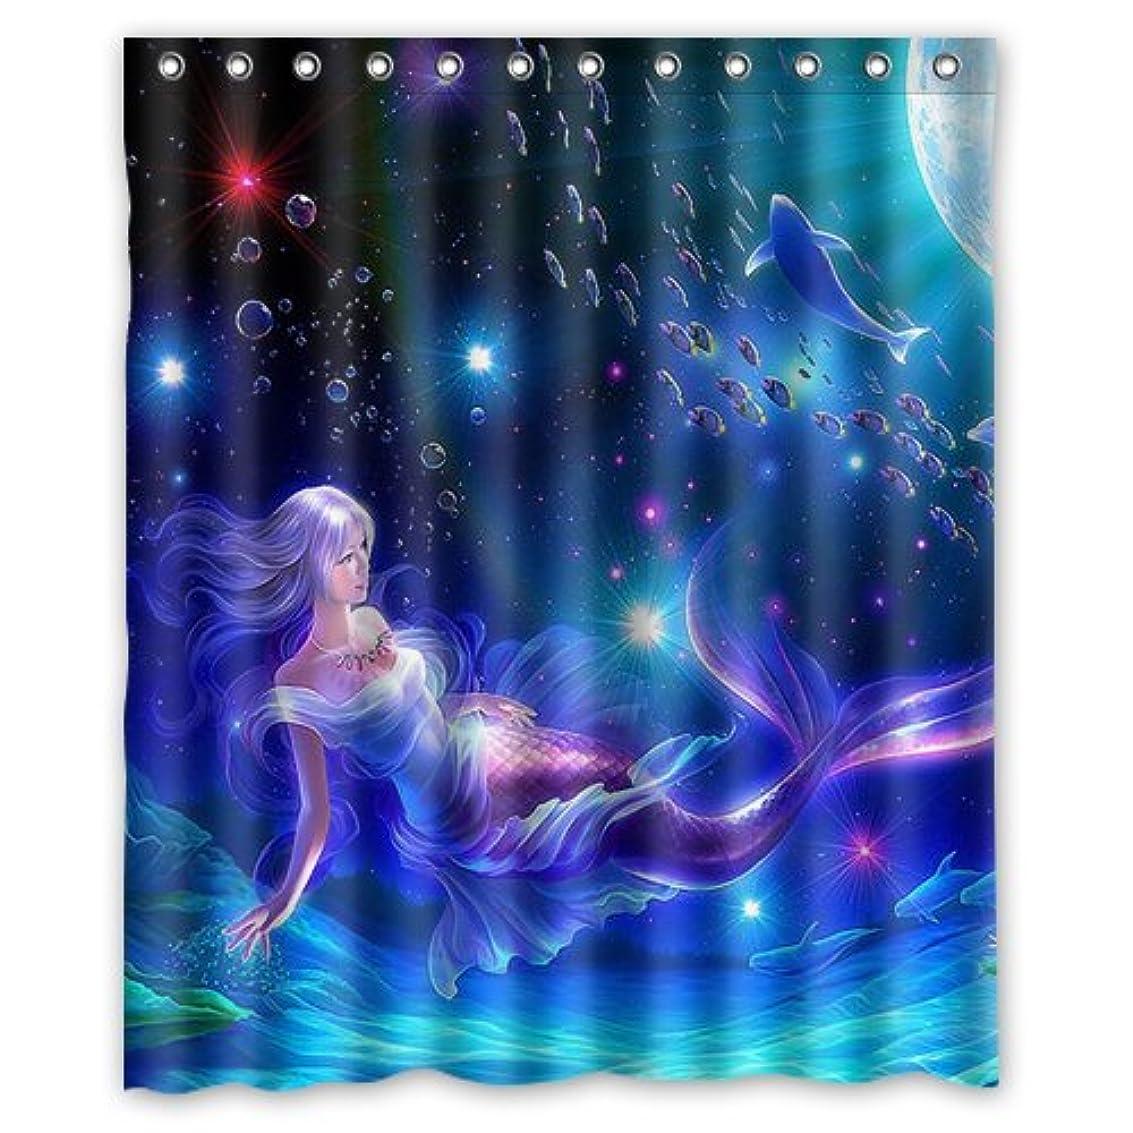 Underwater World Ocean Deep Sea Beautiful Mermaid 60(w)x72(h)Inch Bathroom Waterproof Shower Curtain Bath Curtains utwkt1071047540